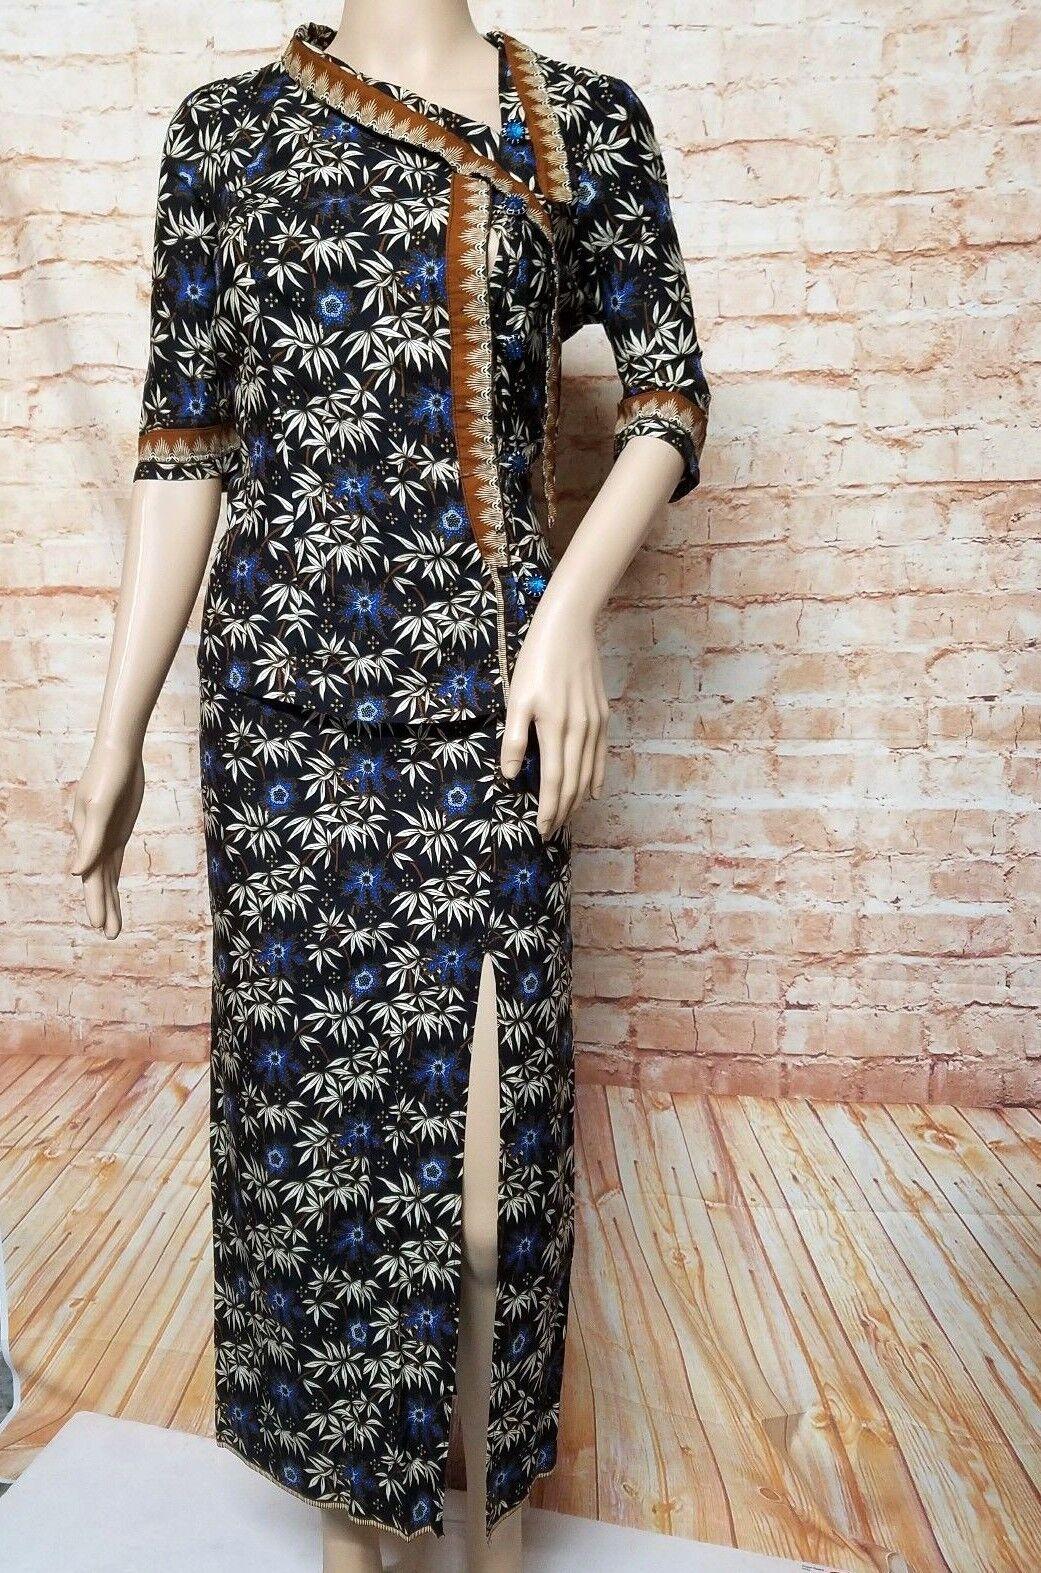 Khmer Set Clothe SARONG Khmer Maxi Slit Skirt Floral Button Down Casual Size M